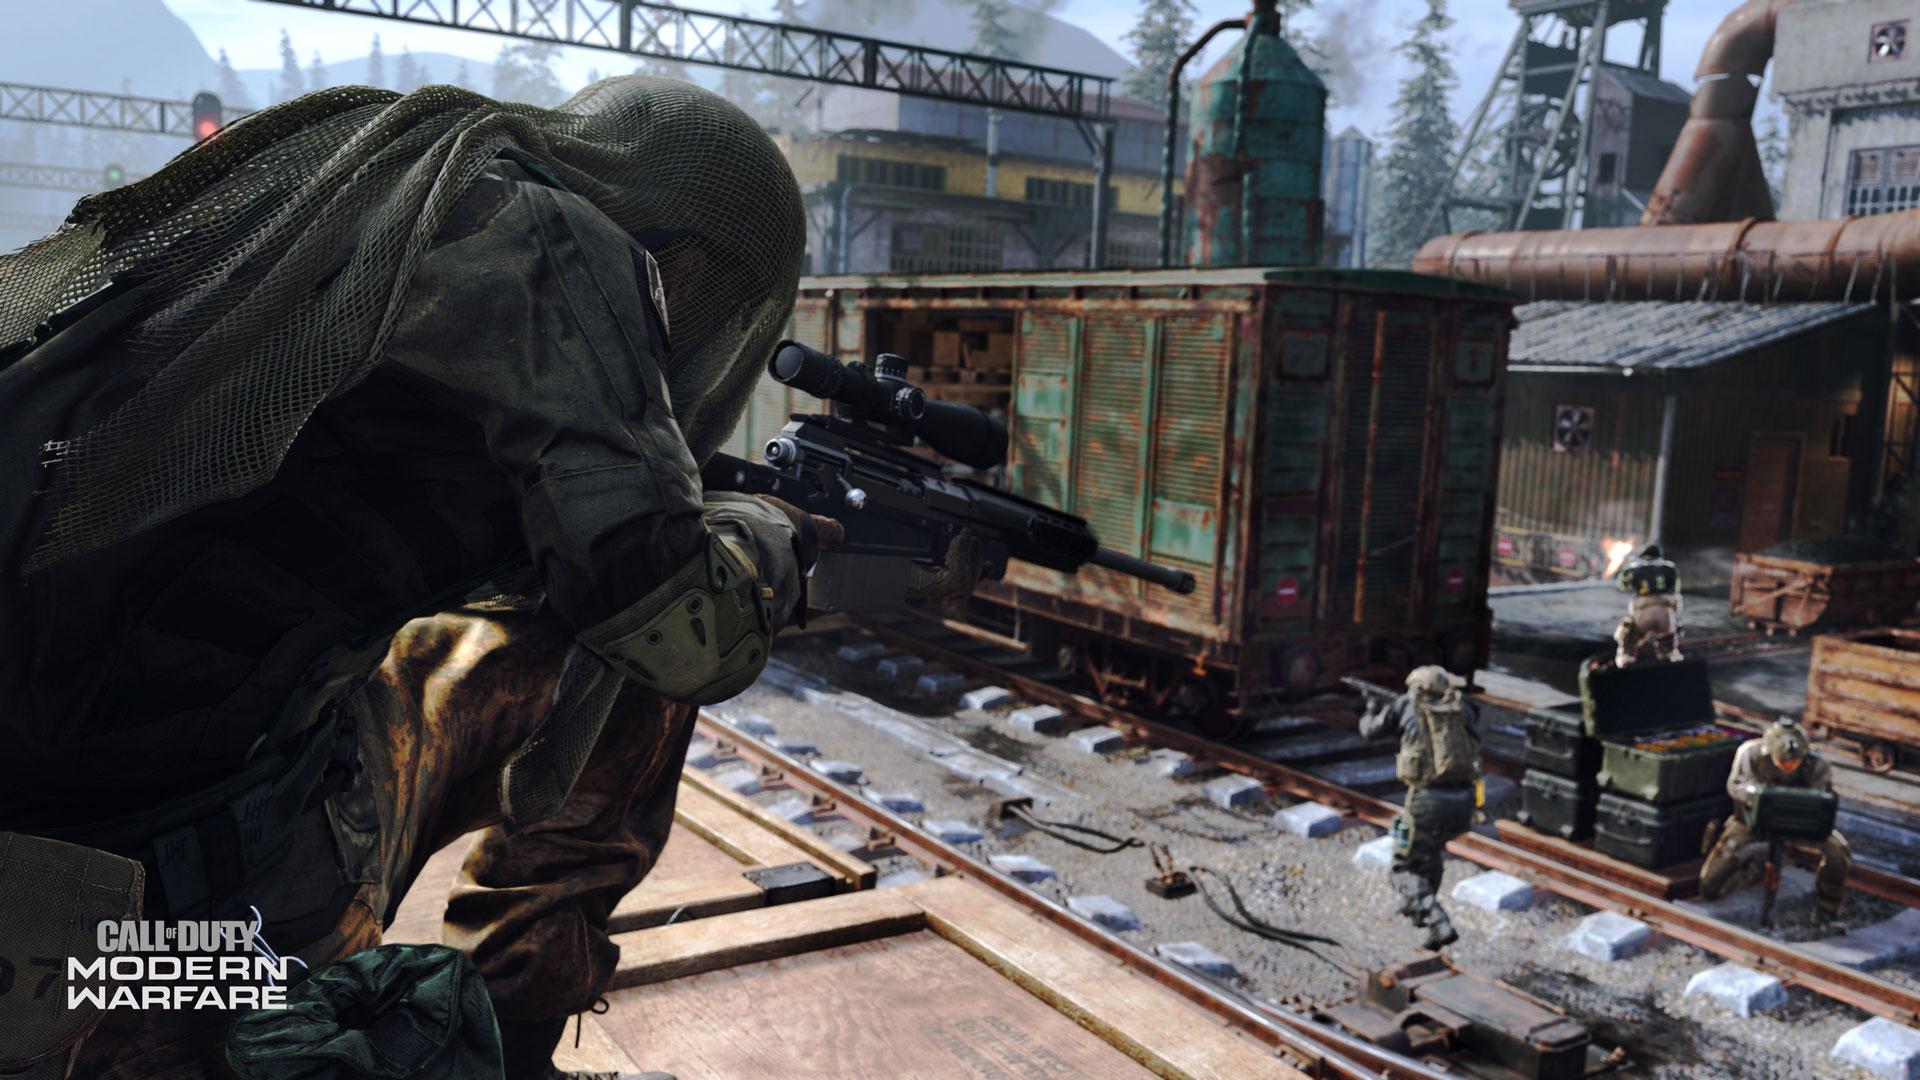 Call Of Duty Modern Warfare Video Game 2019 Photo Gallery Imdb